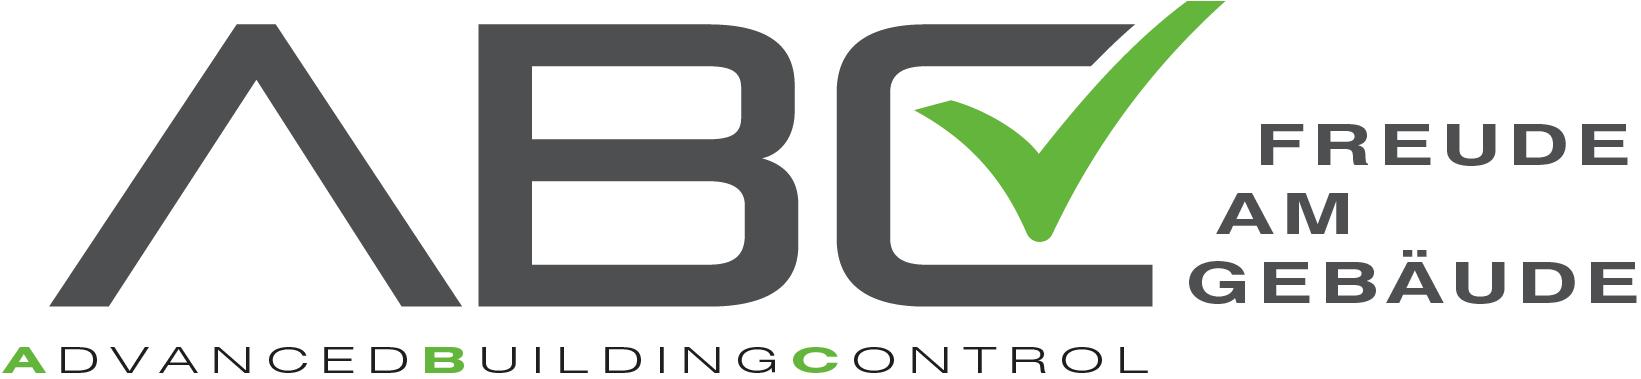 ABC Advanced Building Control GesmbH